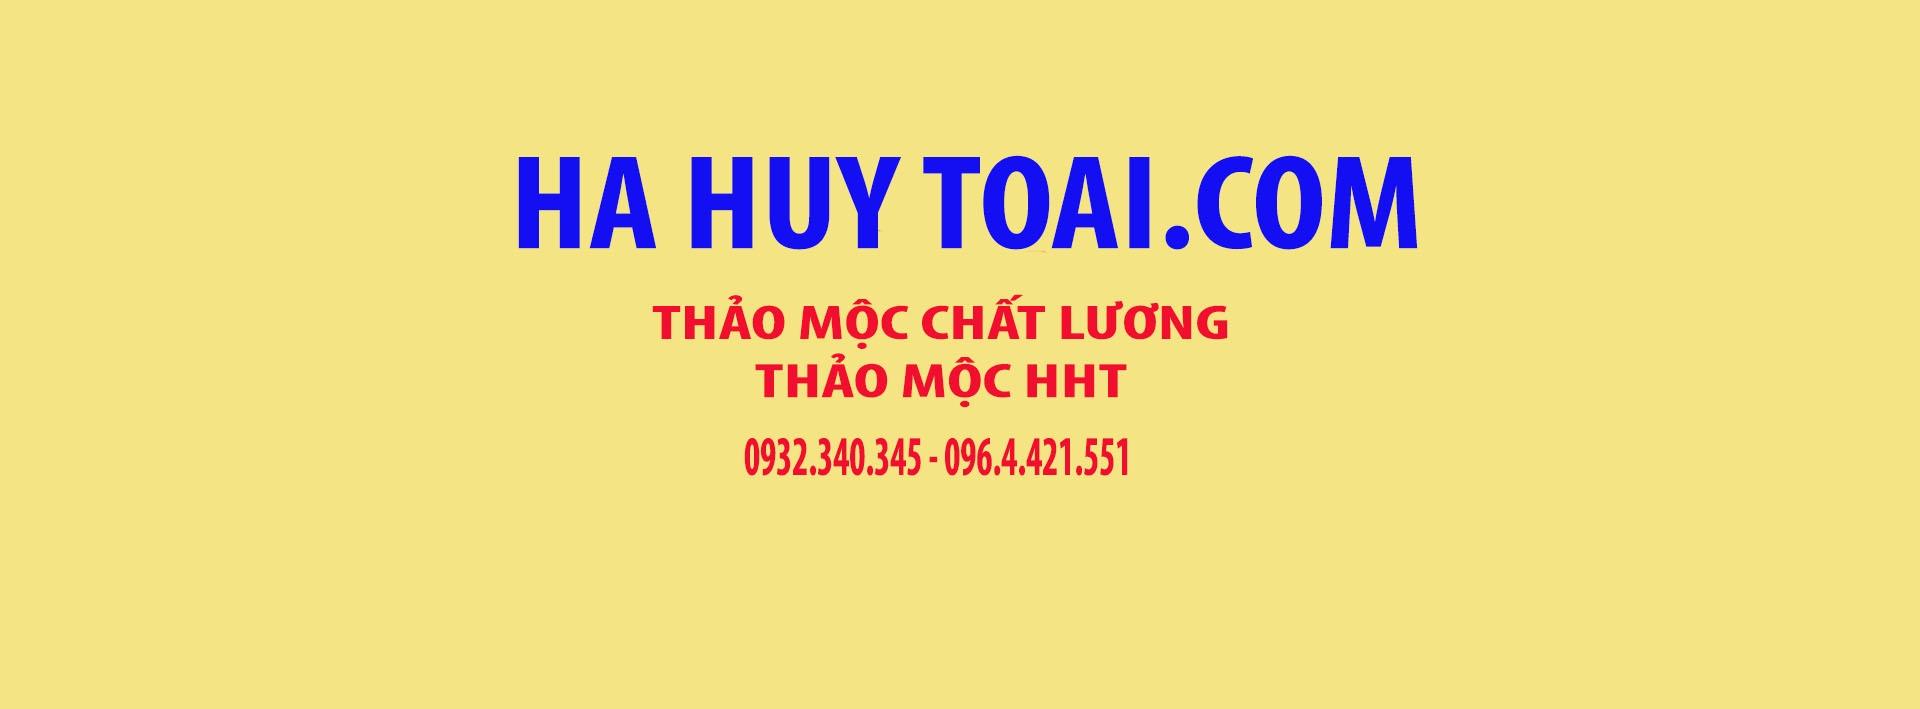 Ha Huy Toai (@hahuytoai) Cover Image